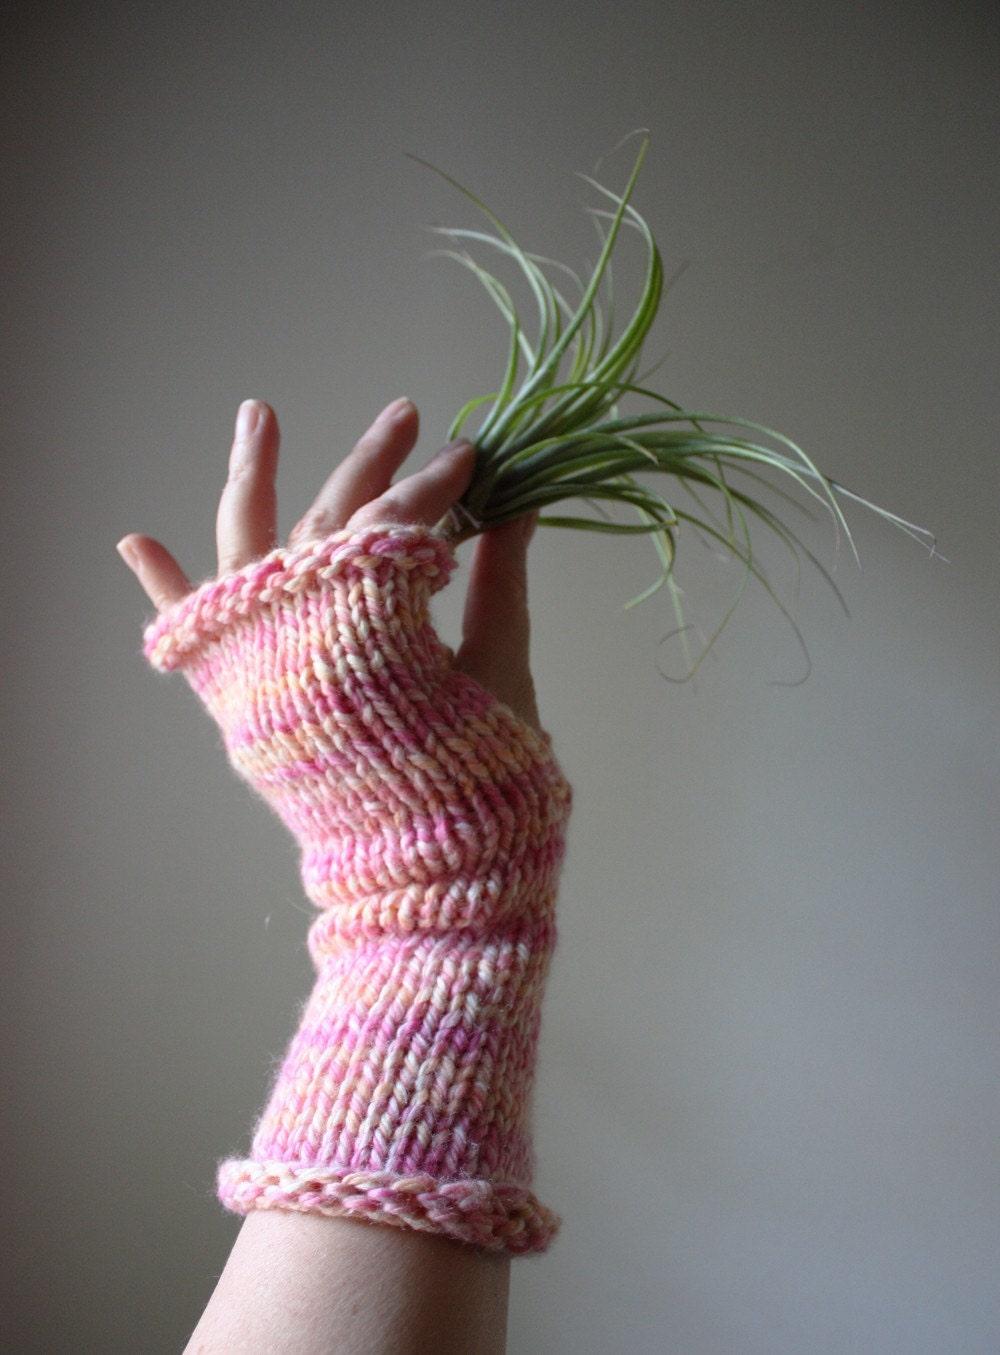 Fingerless Gloves Knitting Pattern Double Pointed Needles : Knitting Pattern / Fingerless Mittens Mitts / Long and